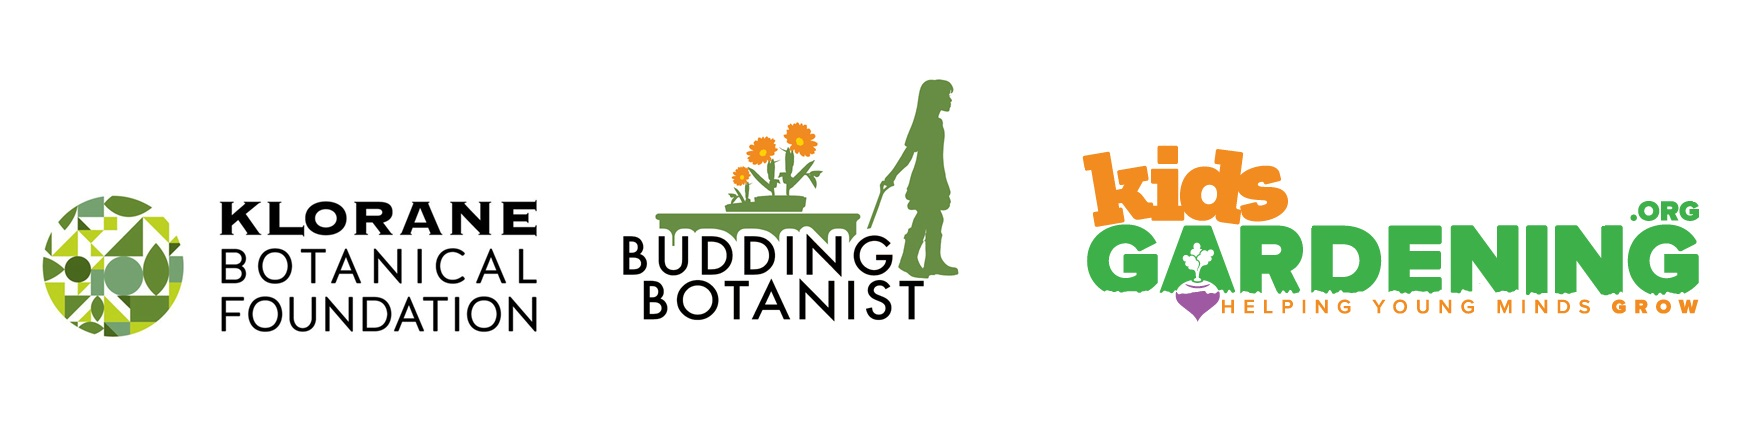 DC's Eagle Academy Public Charter School is a '18 Budding Botanist Grant Winner